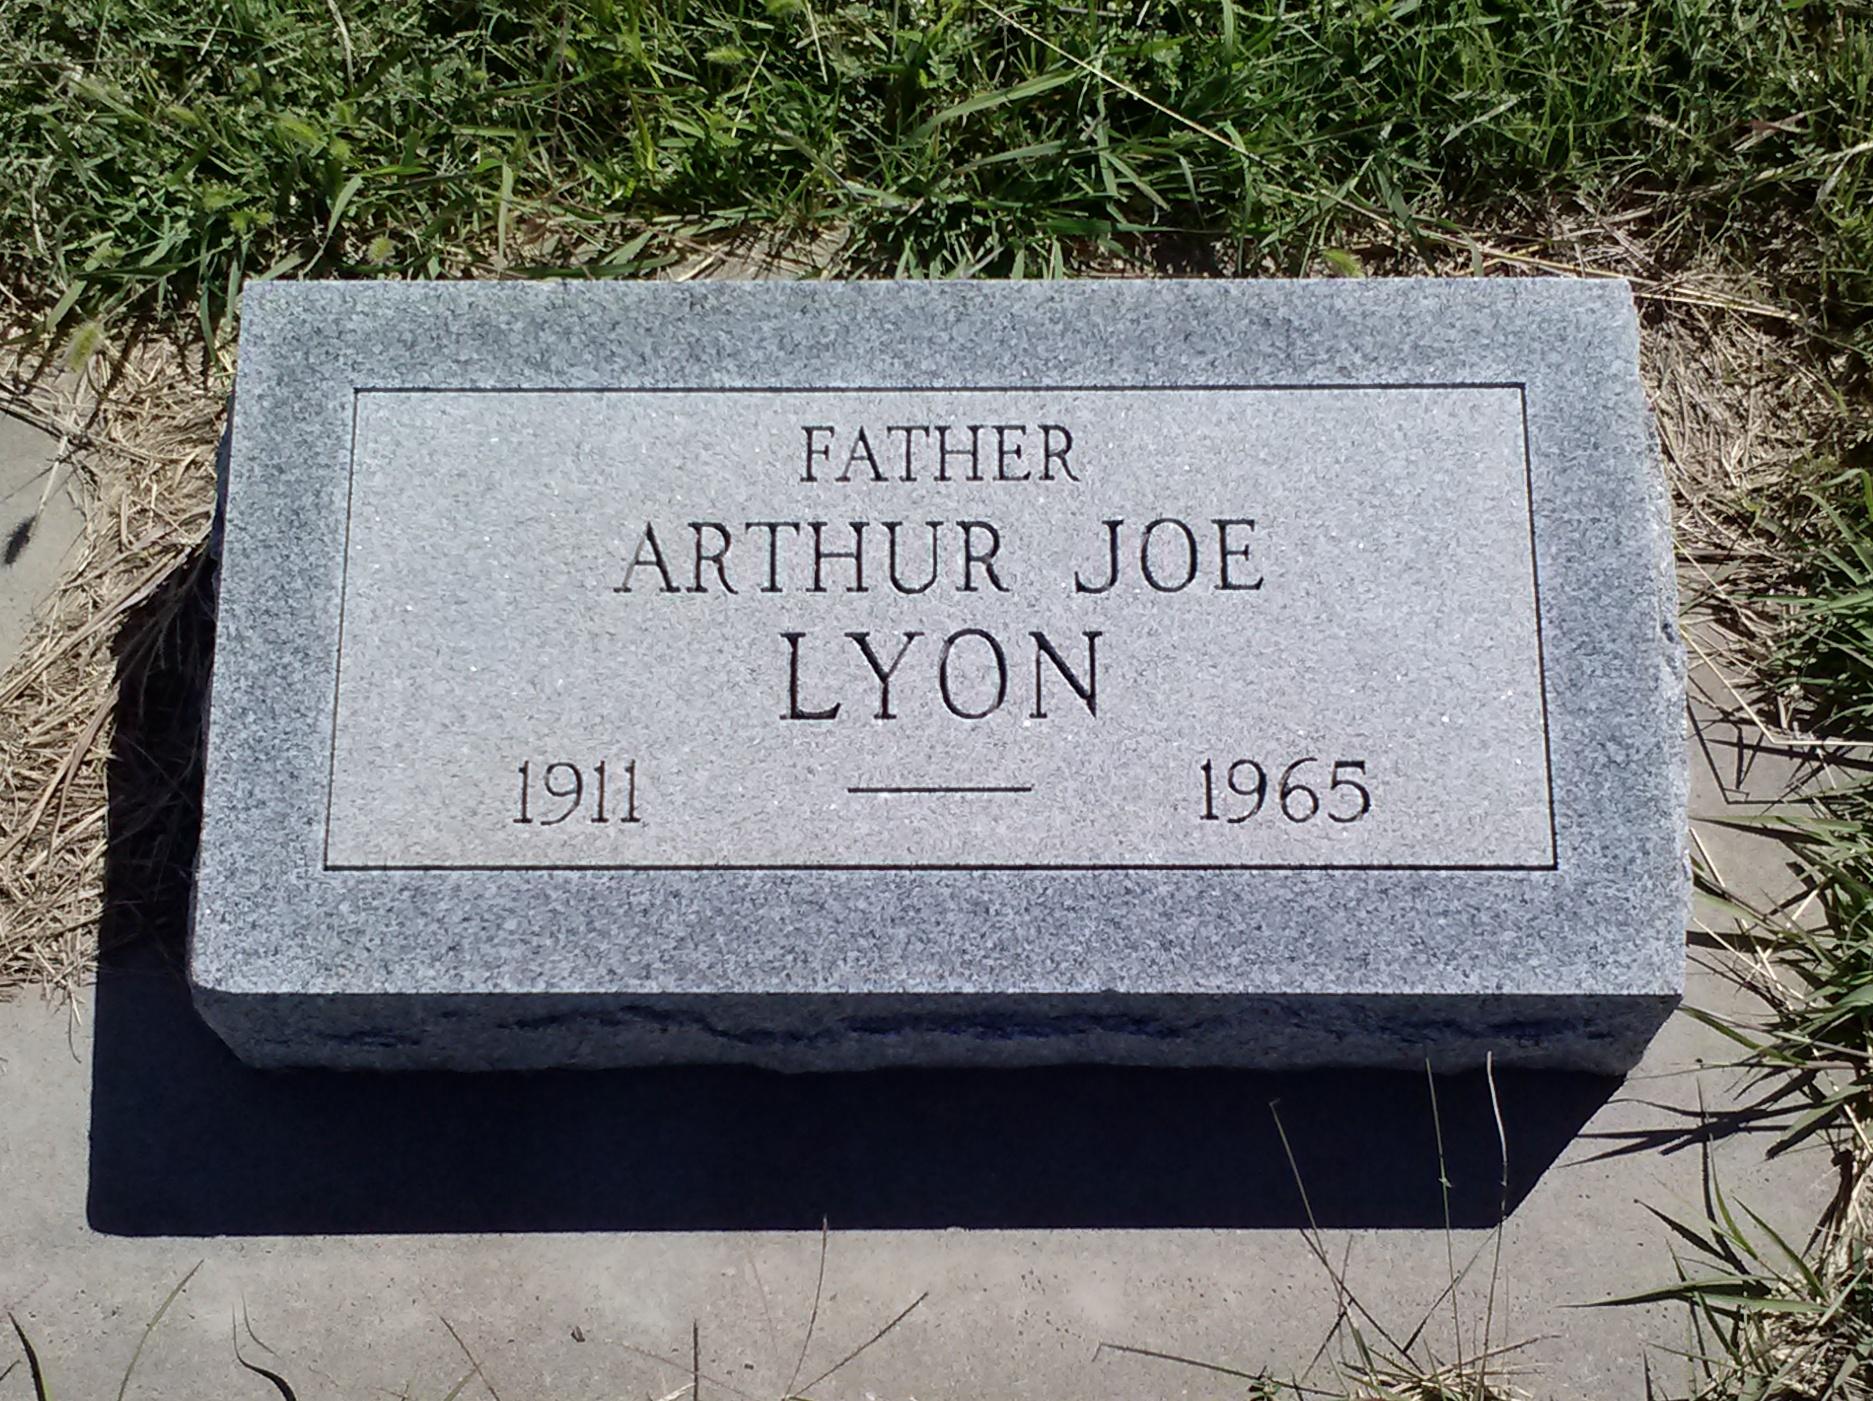 Arthur Joe Lyon